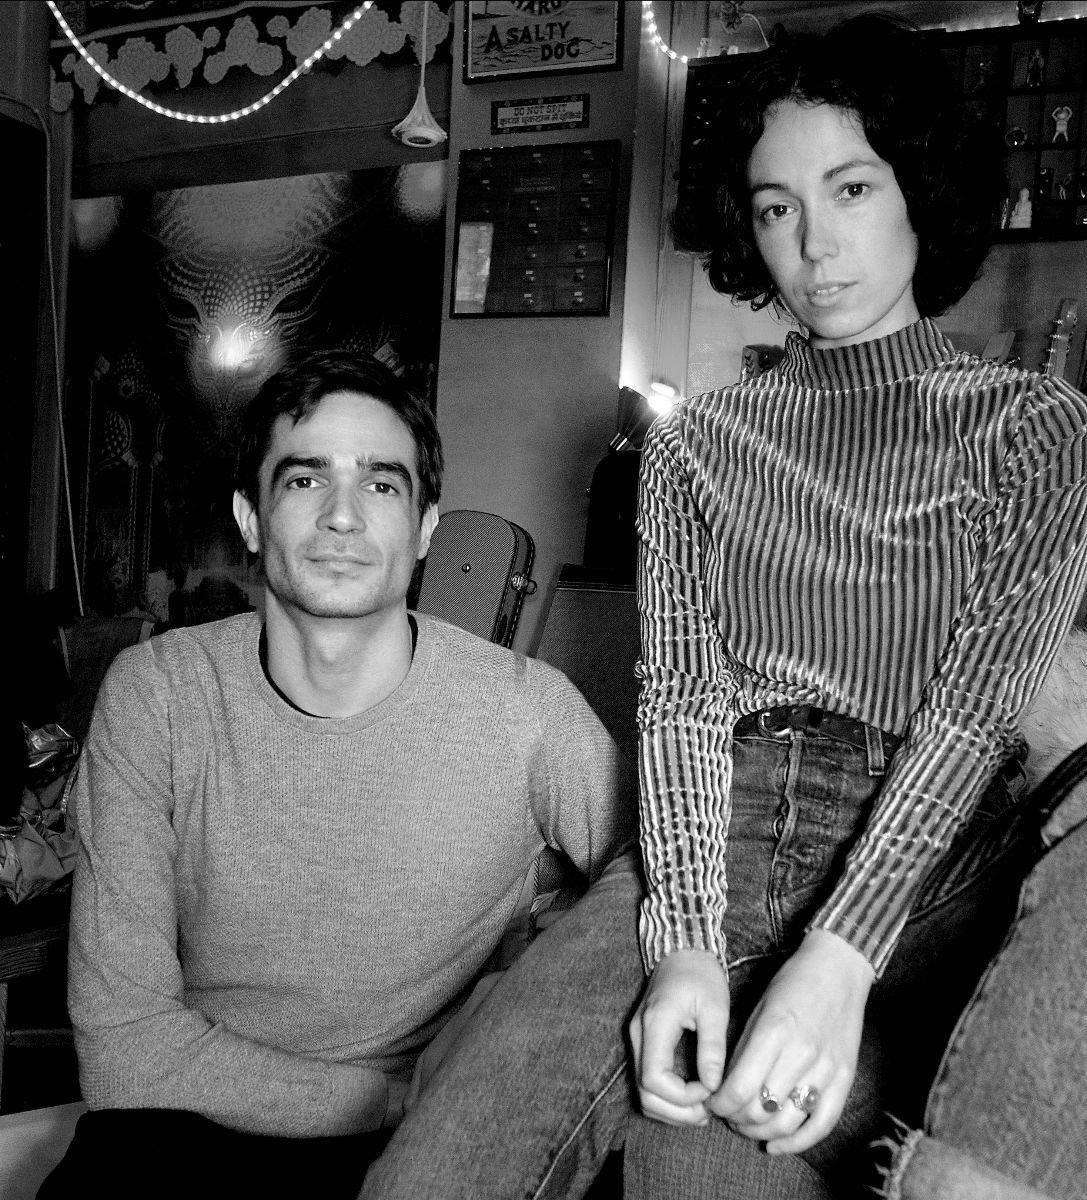 Jon Hopkins and Kelly Lee Owens